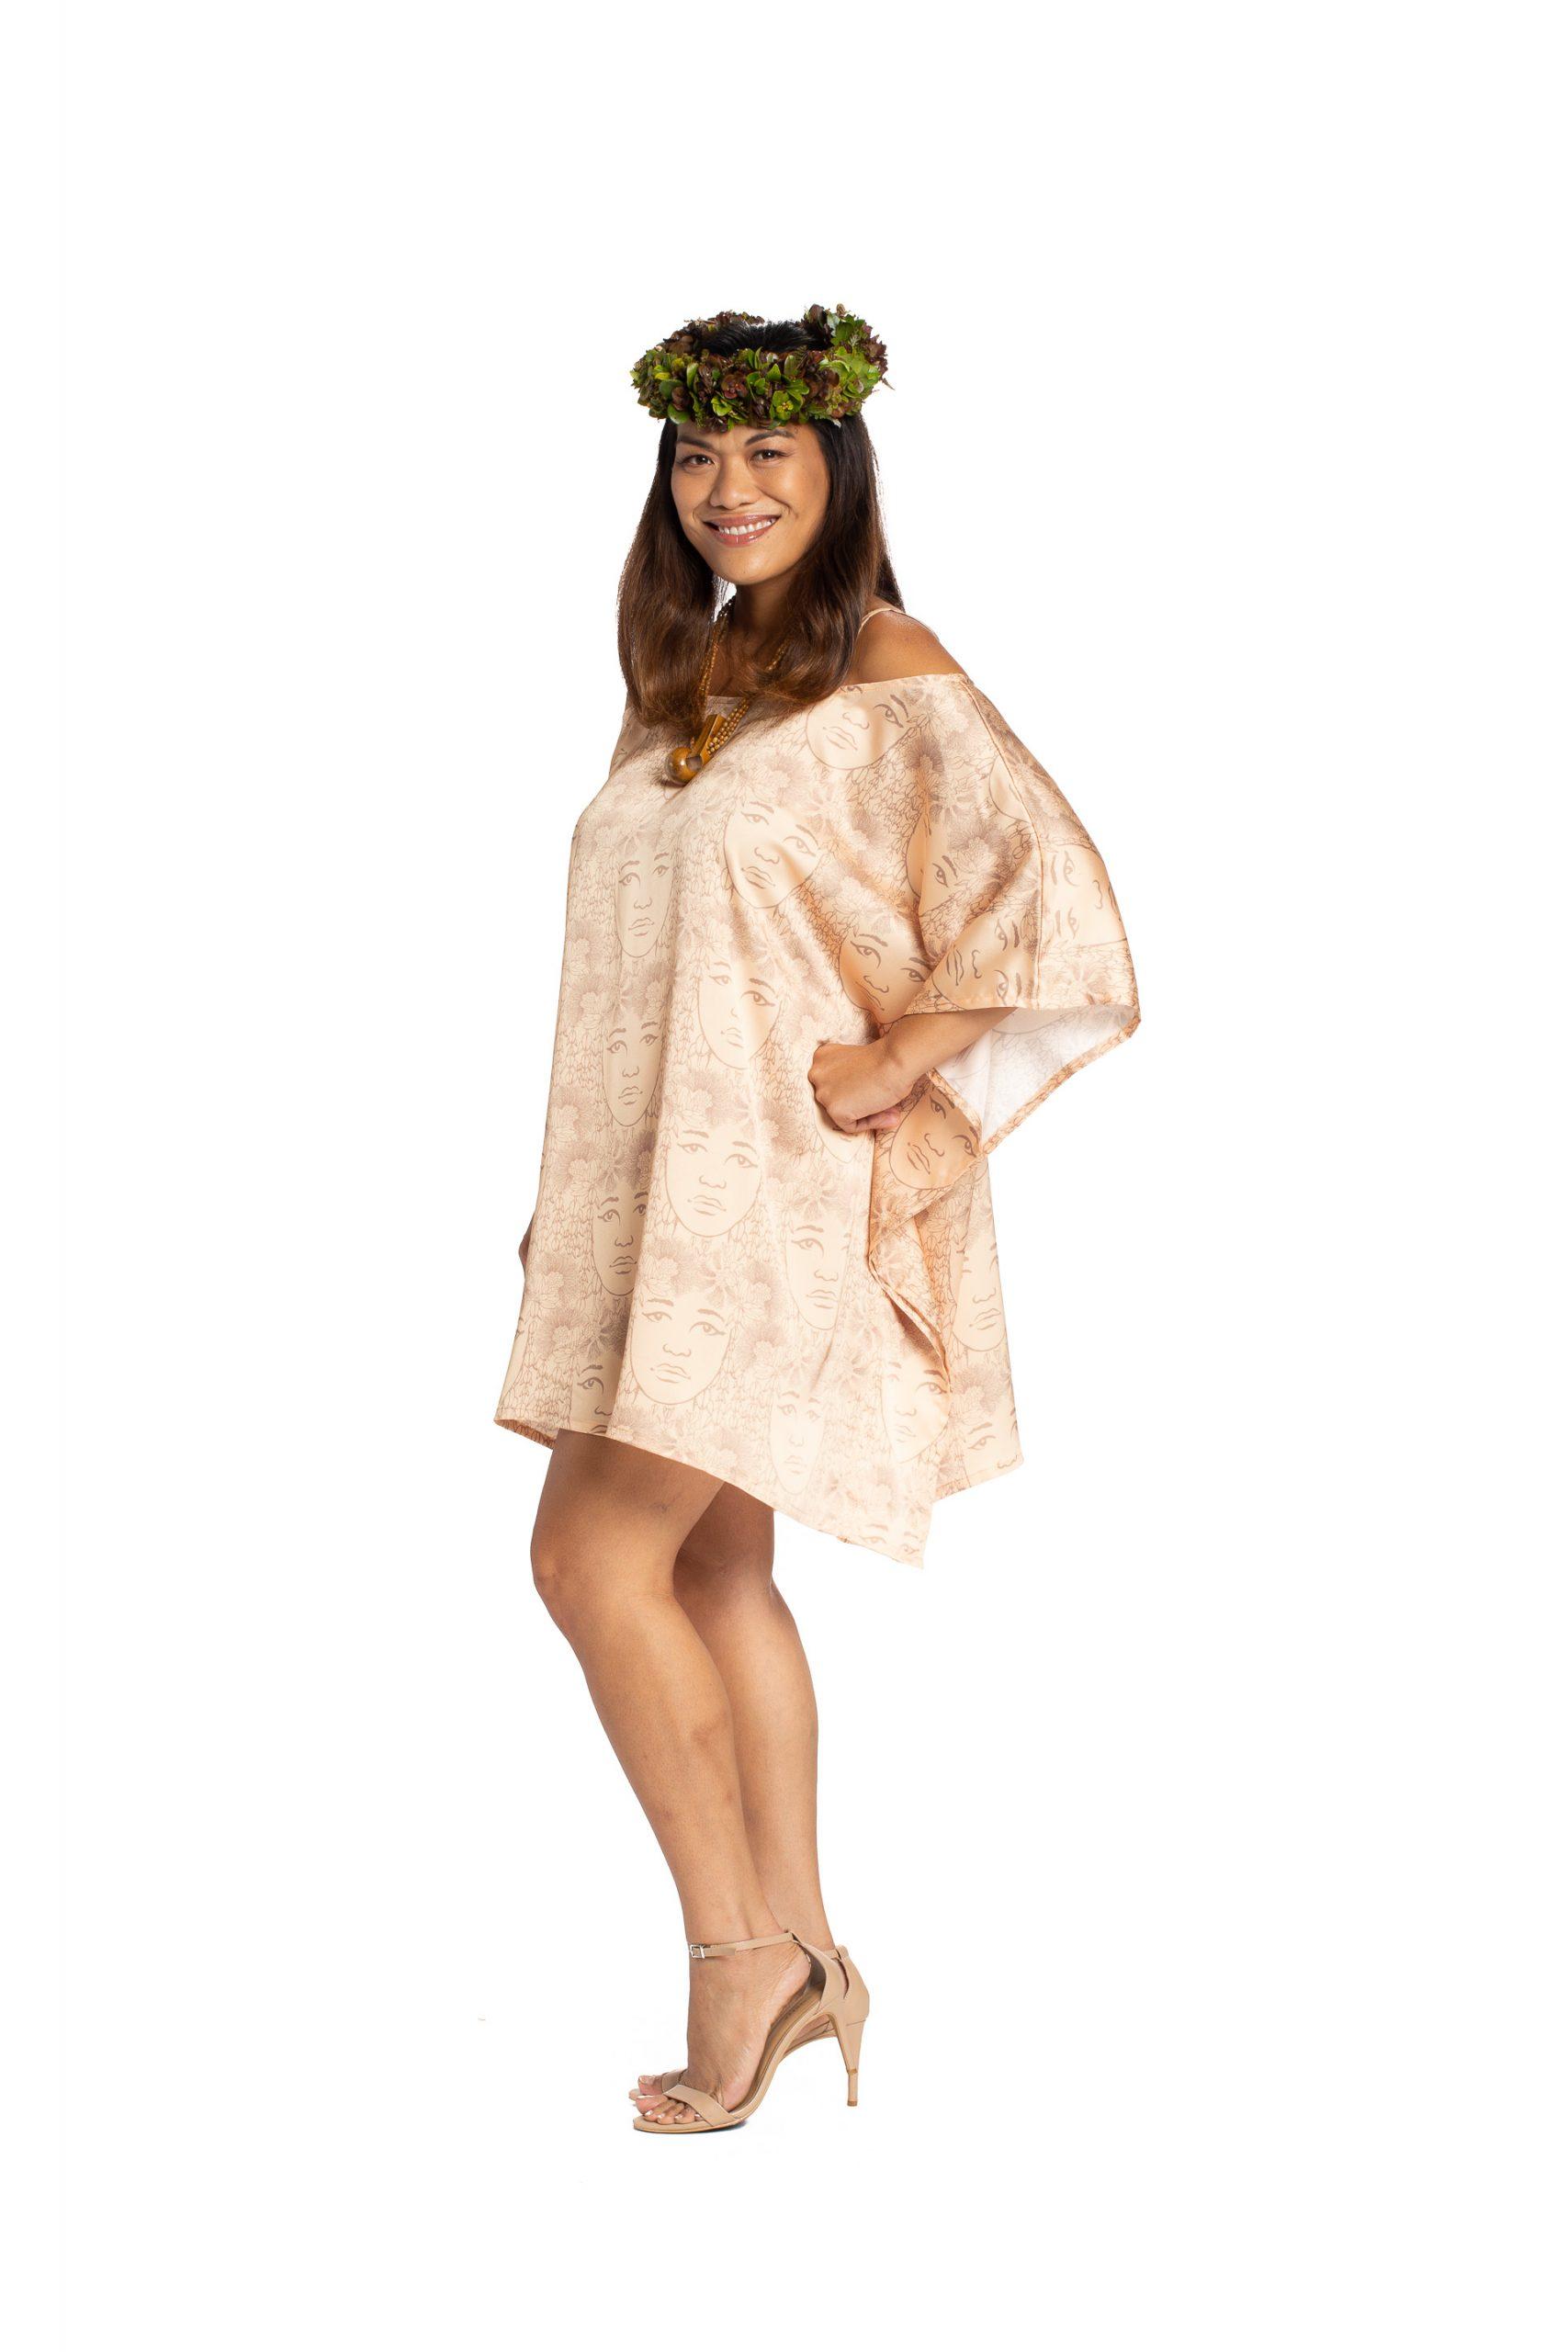 Model wearing Malalama Top in Apricot Sherbert/Gingersnap - Side View